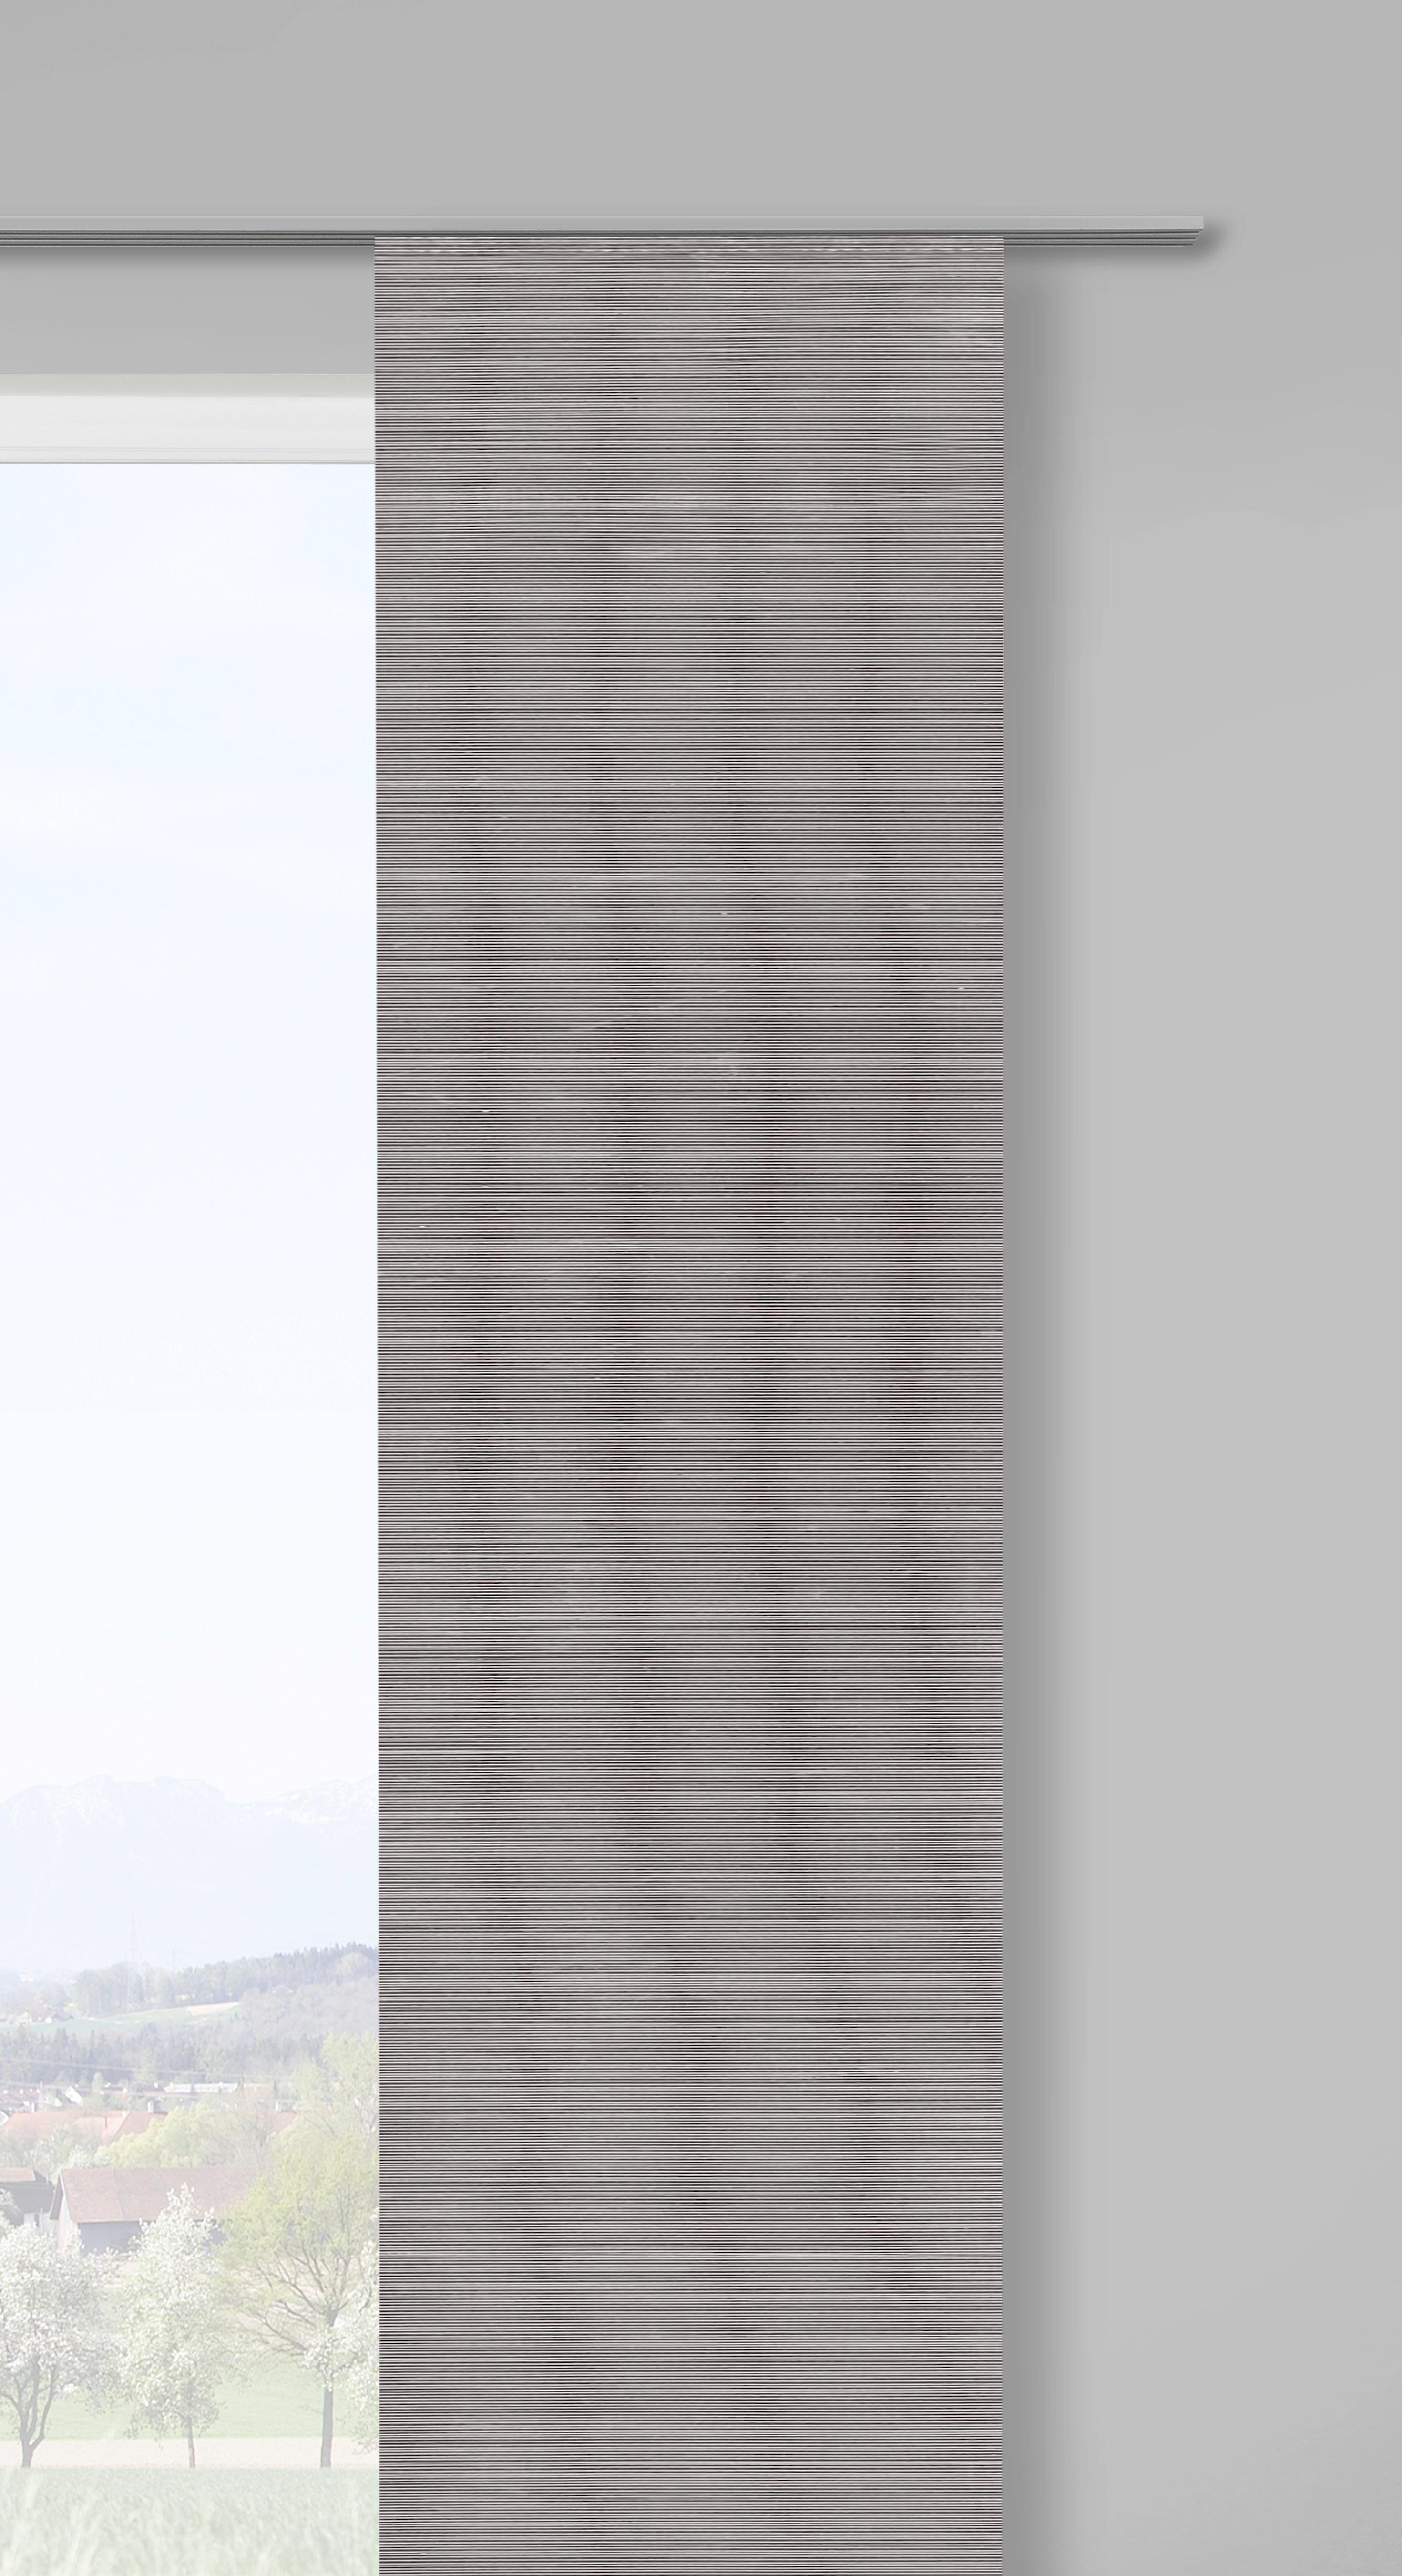 Lapfüggöny Loft - szürke, modern, textil (60/245cm) - MÖMAX modern living